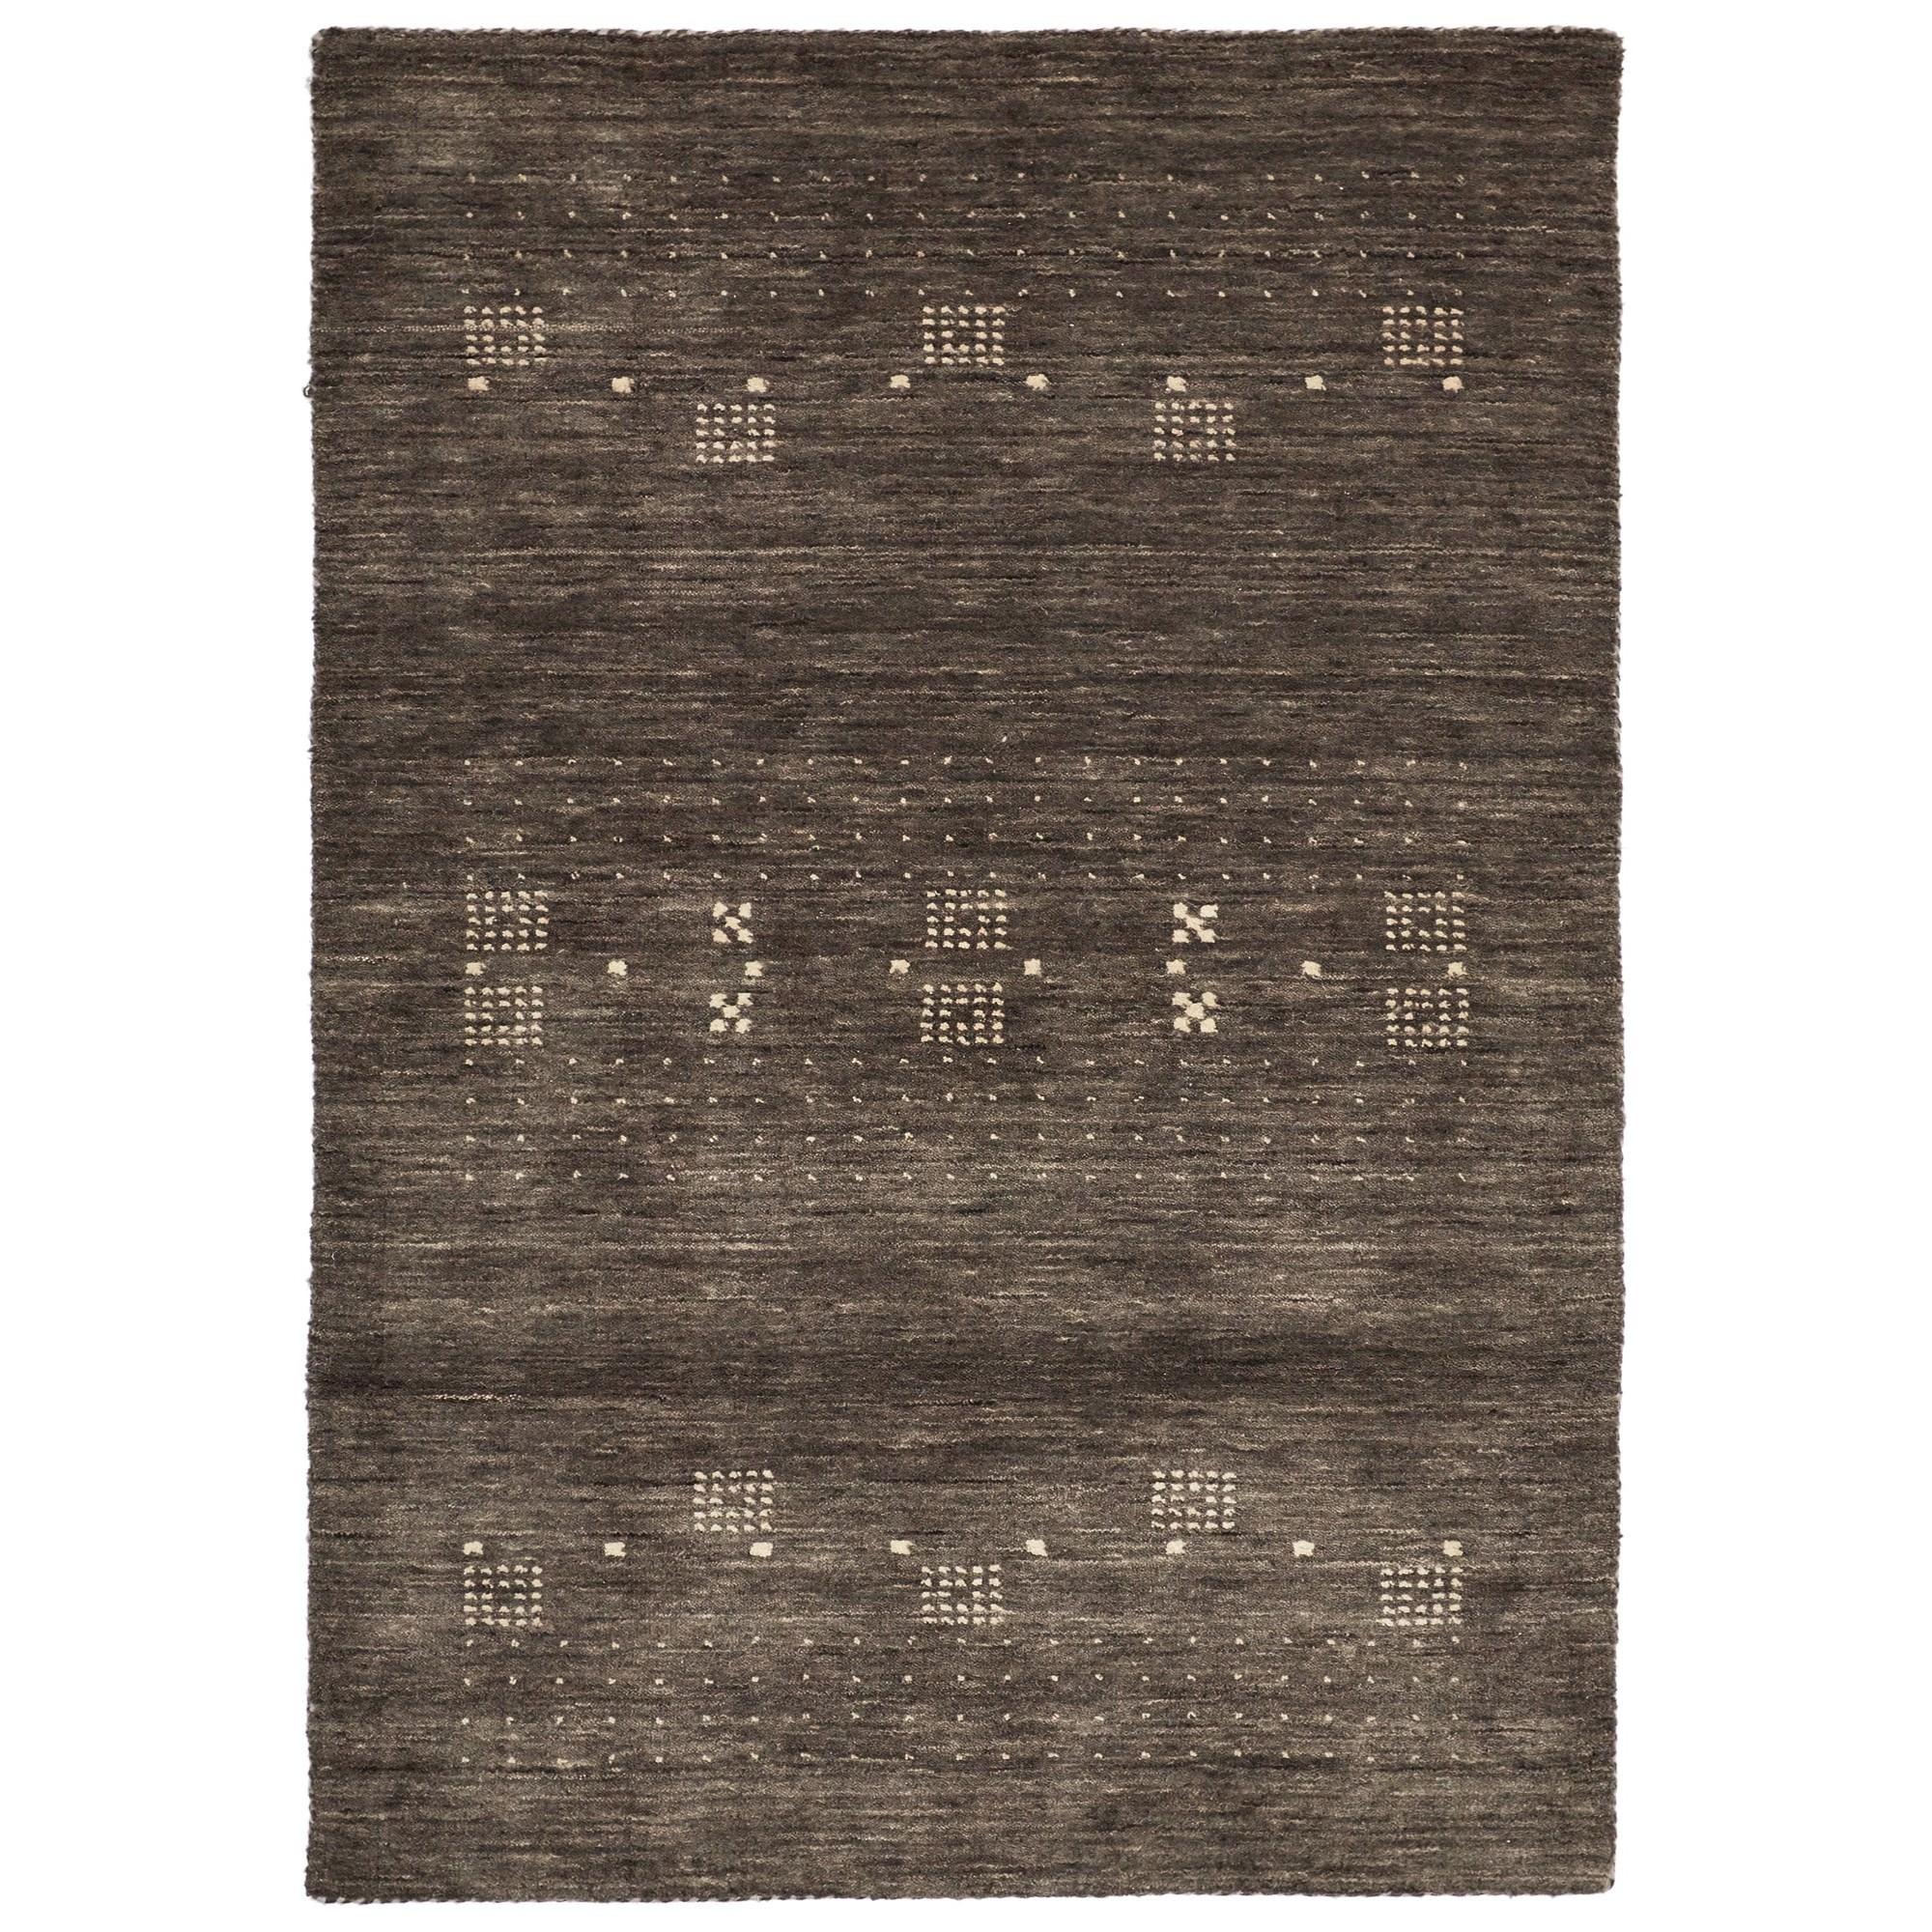 Lori No.042 Wool Tribal Rug, 225x155cm, Grey